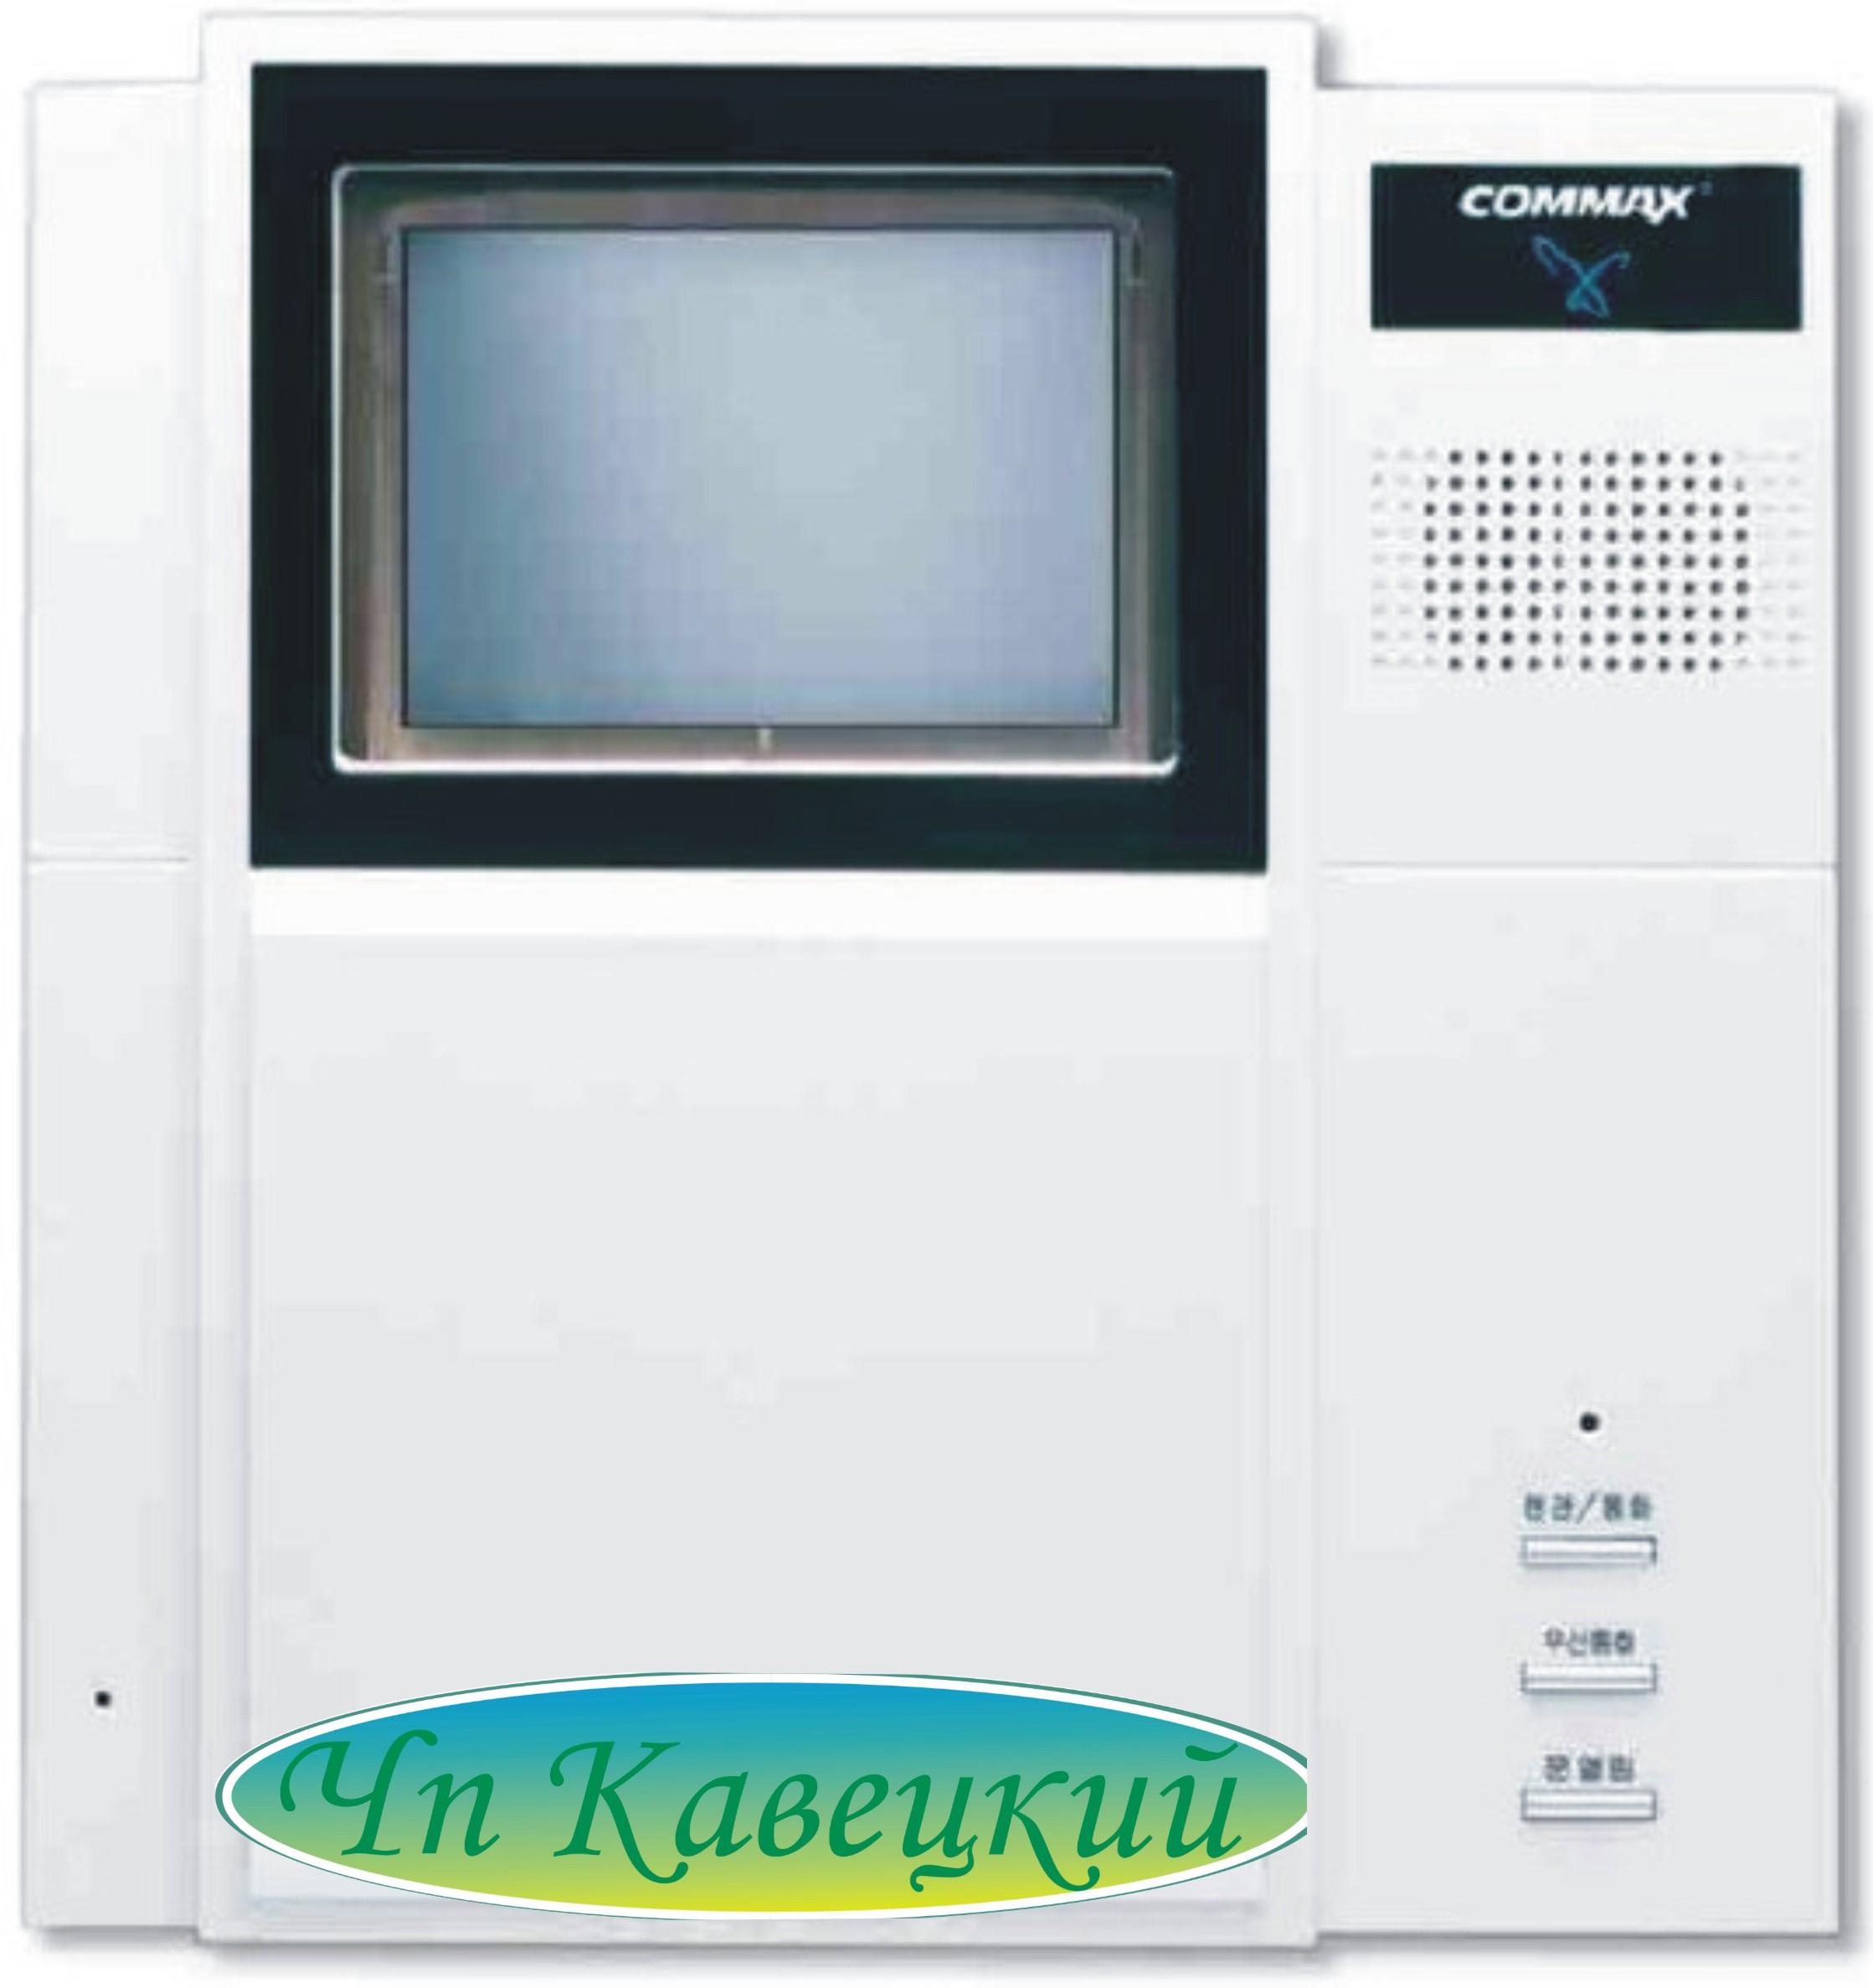 инструкция по установке commax dpv 4pb